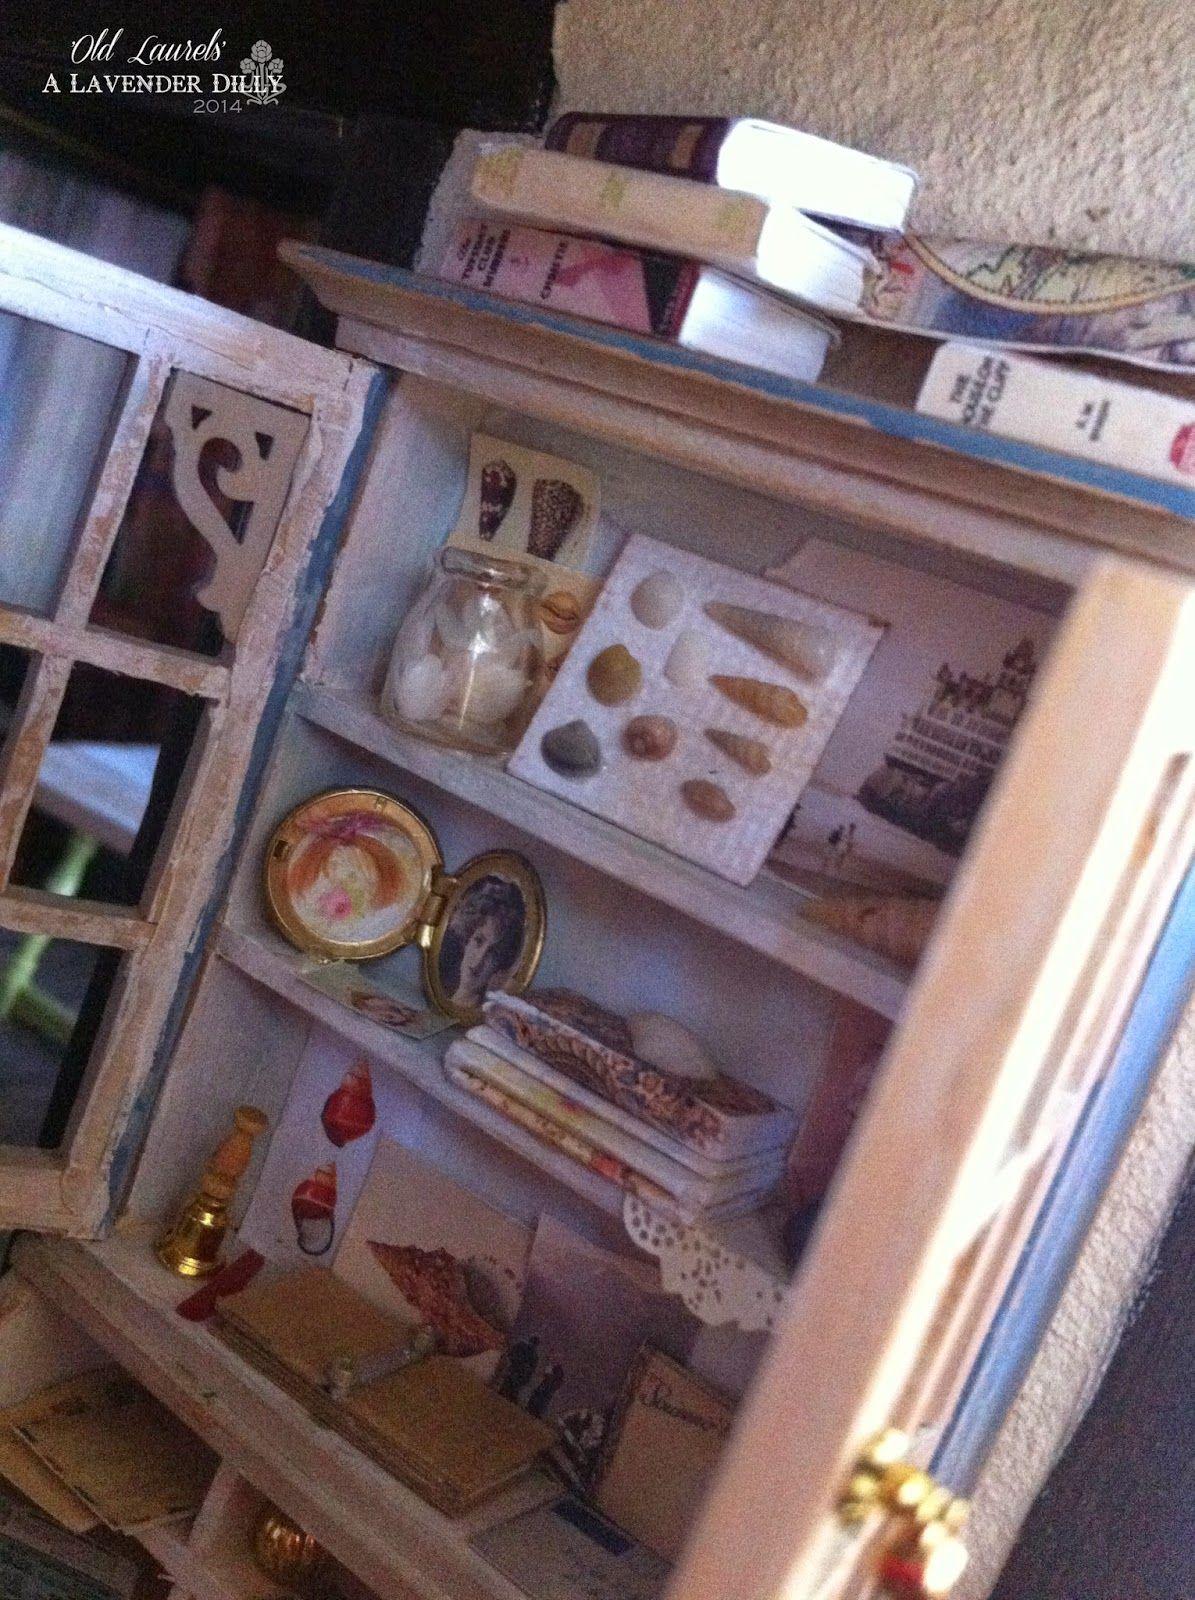 A Lavender Dilly: Old Laurels Sitting Room